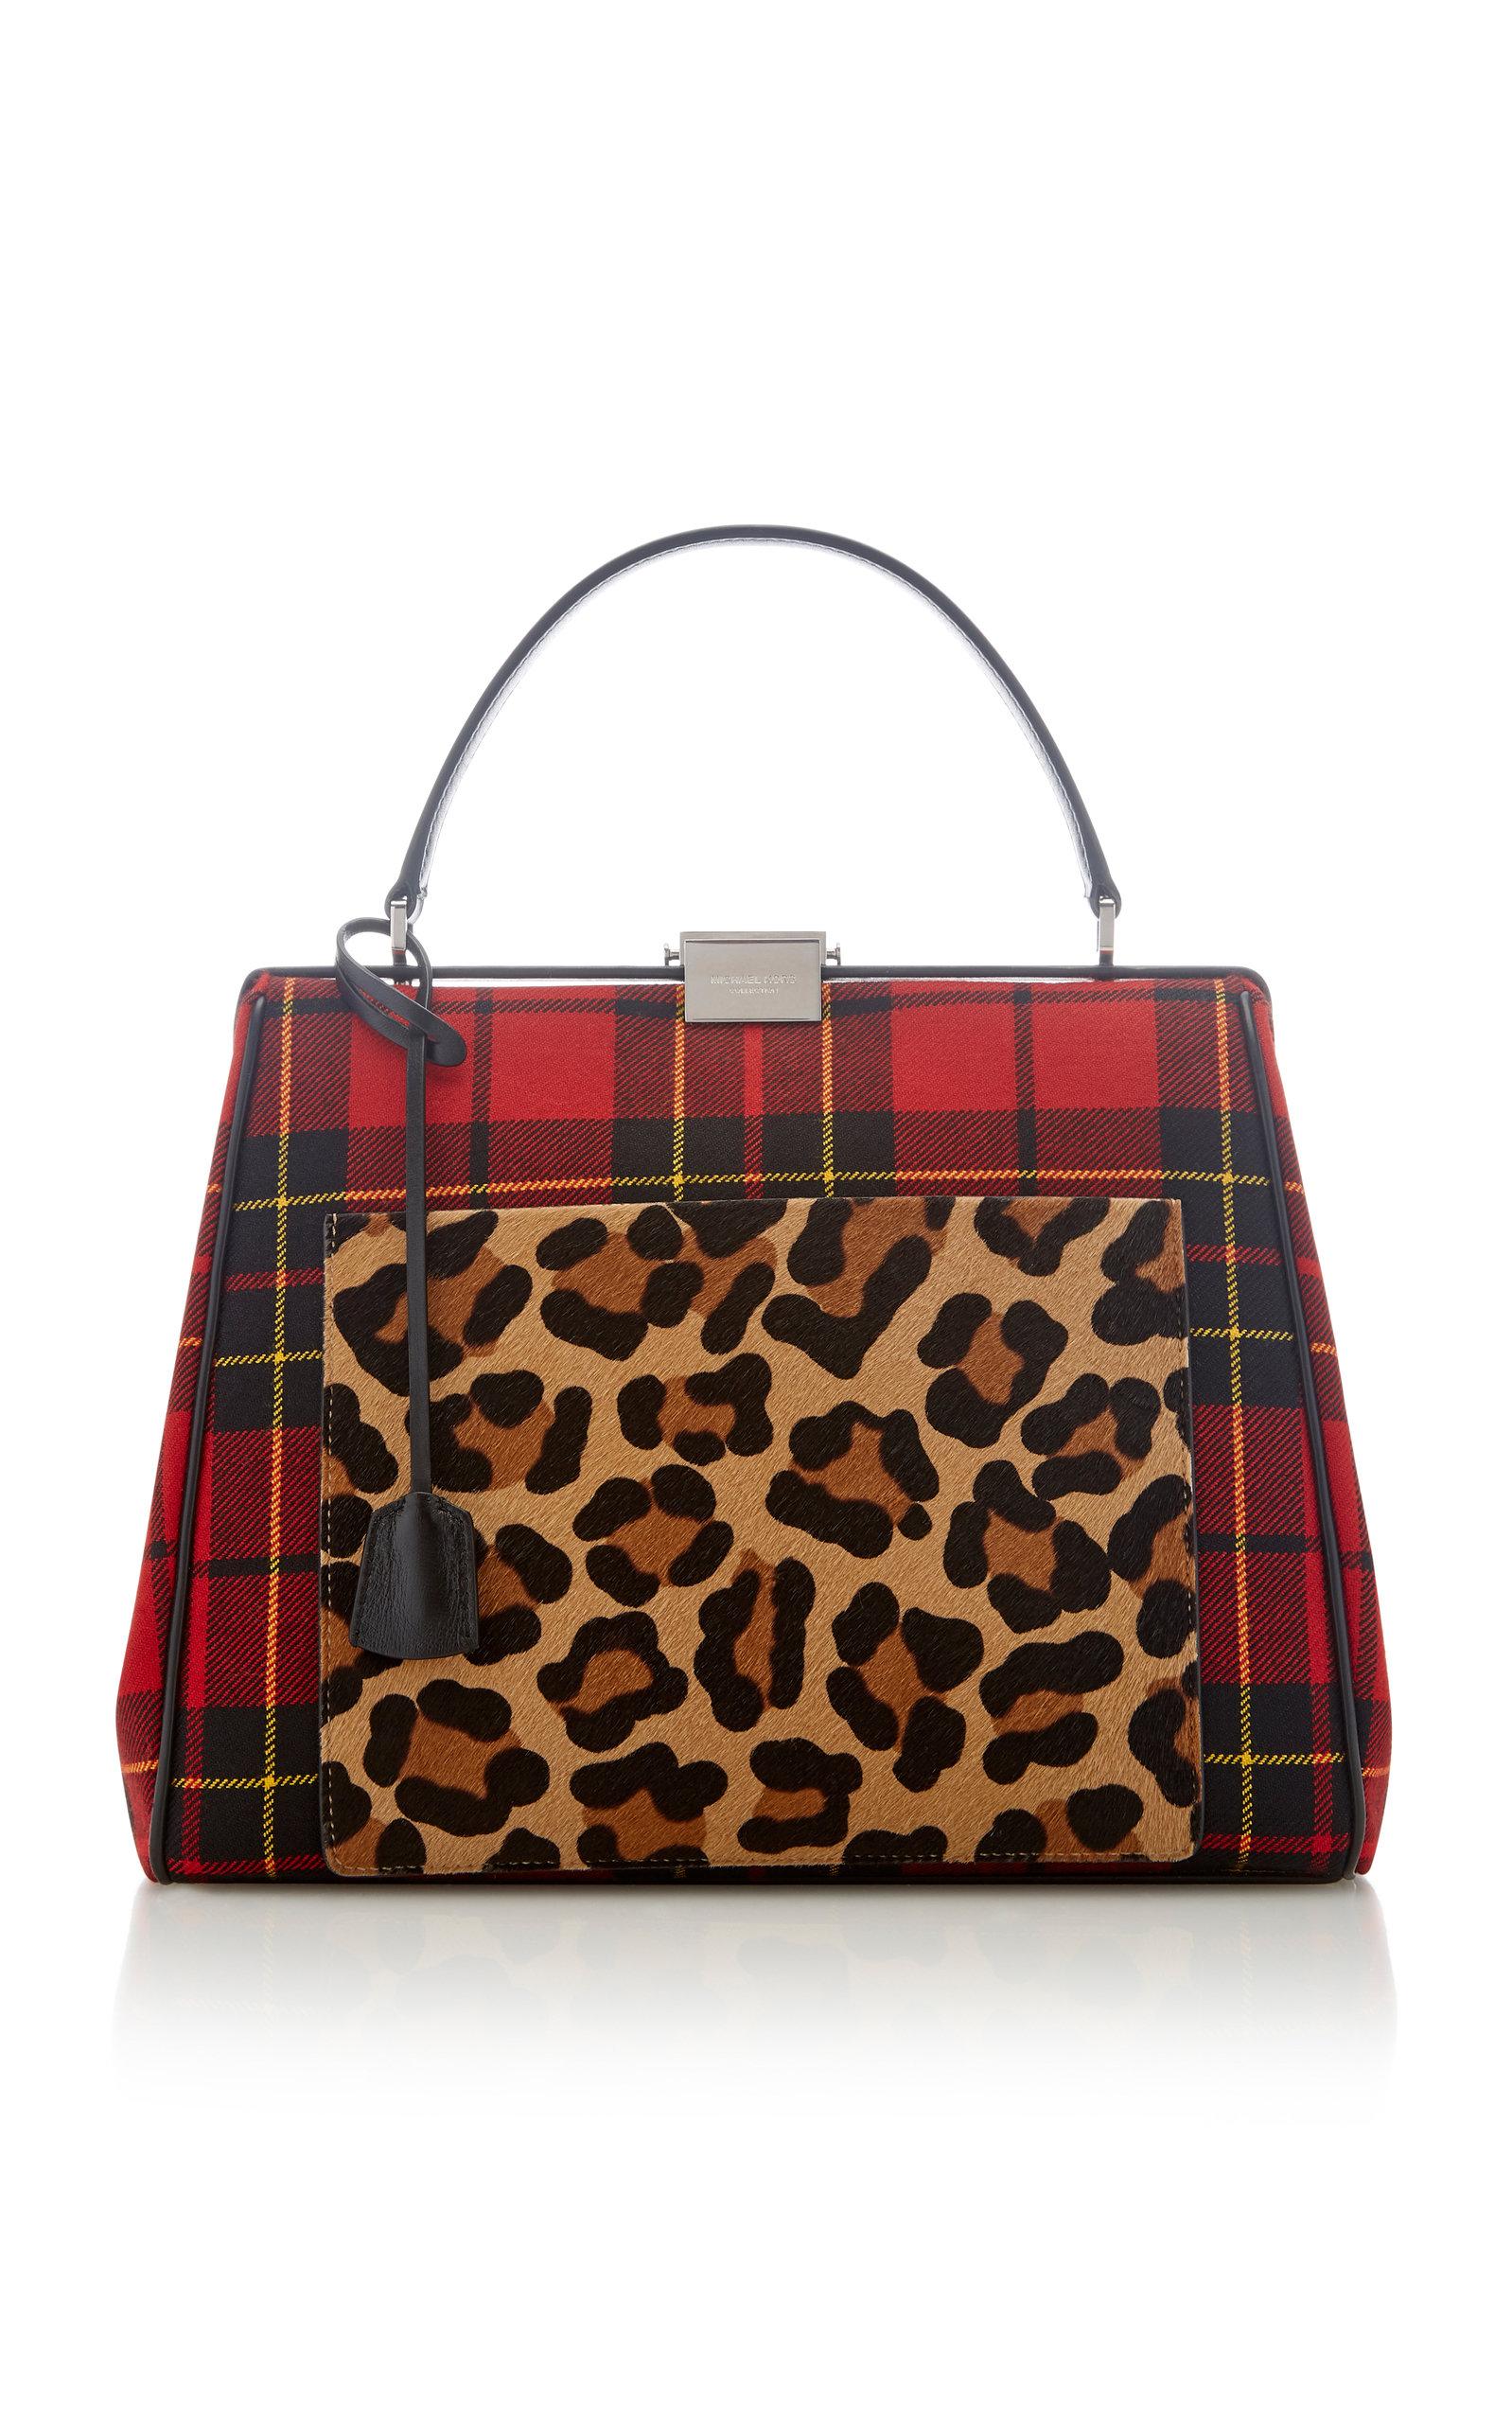 7570a7ccc9d8 Michael Kors CollectionRed Brodie Tartan Simone Frame Bag. CLOSE. Loading